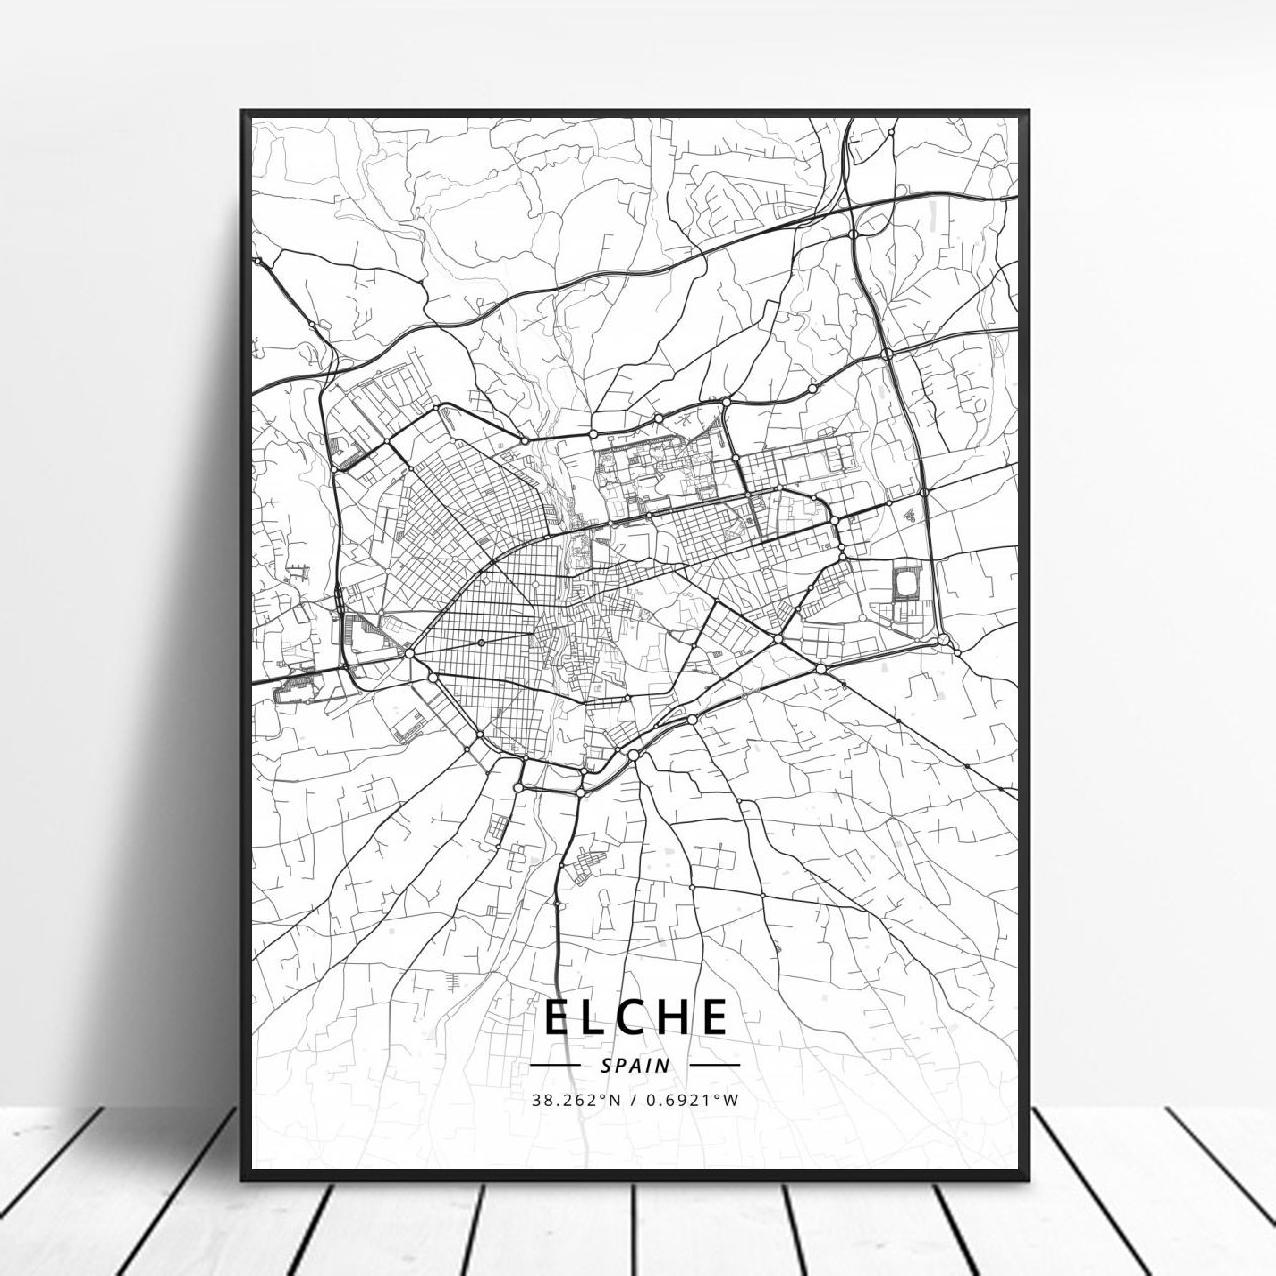 Póster de mapa de arte de España, Elche Pamplona vitoria-gasteiz Madrid Albacete...